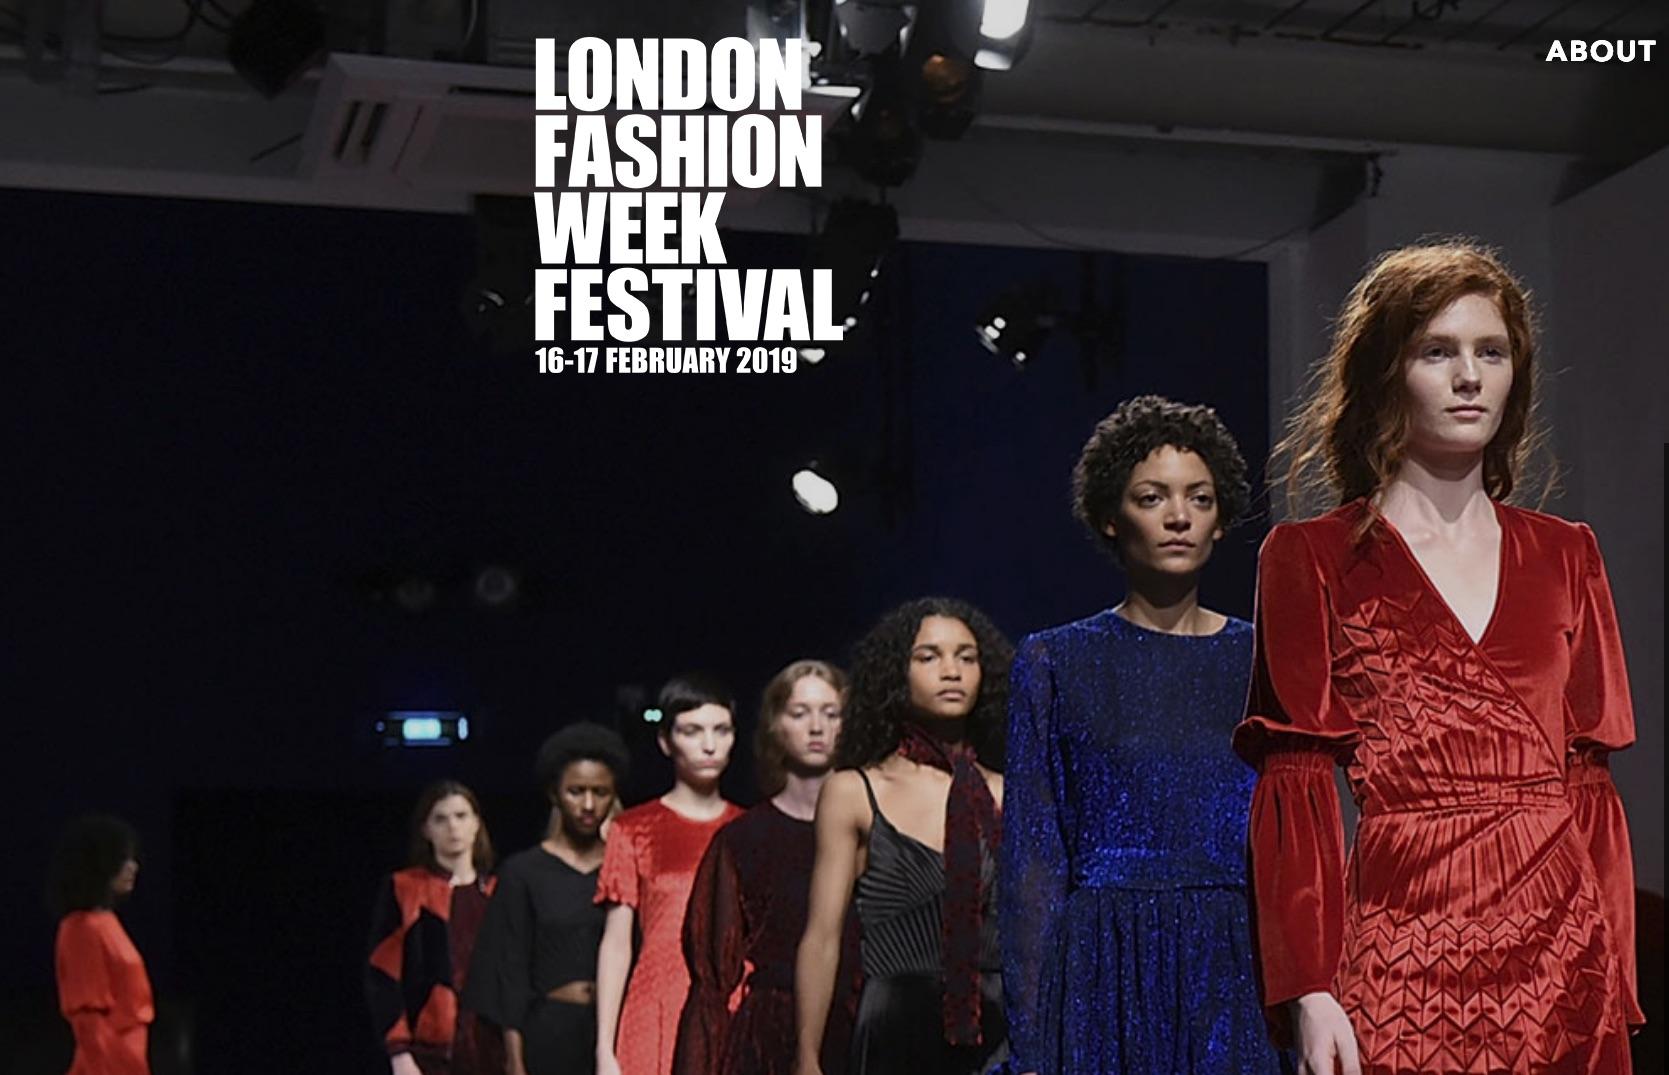 LONDON FASHION WEEK FEBRUARY 2019 – A CELEBRATION OF FASHION